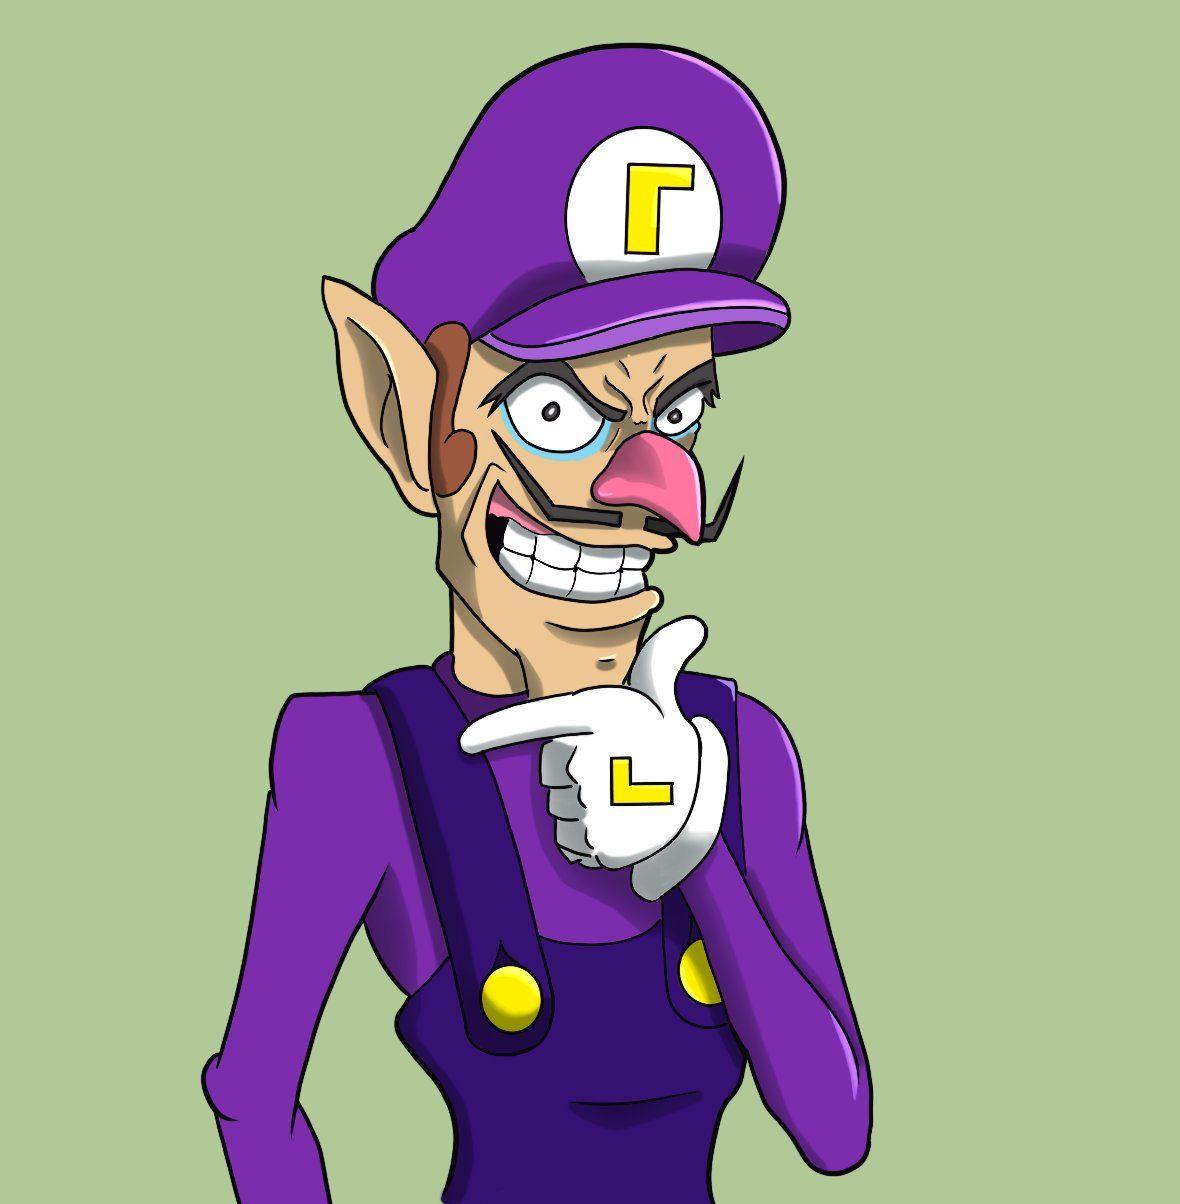 Waluigi By Mikenicoart On Twitter Super Mario Mario Characters Mario